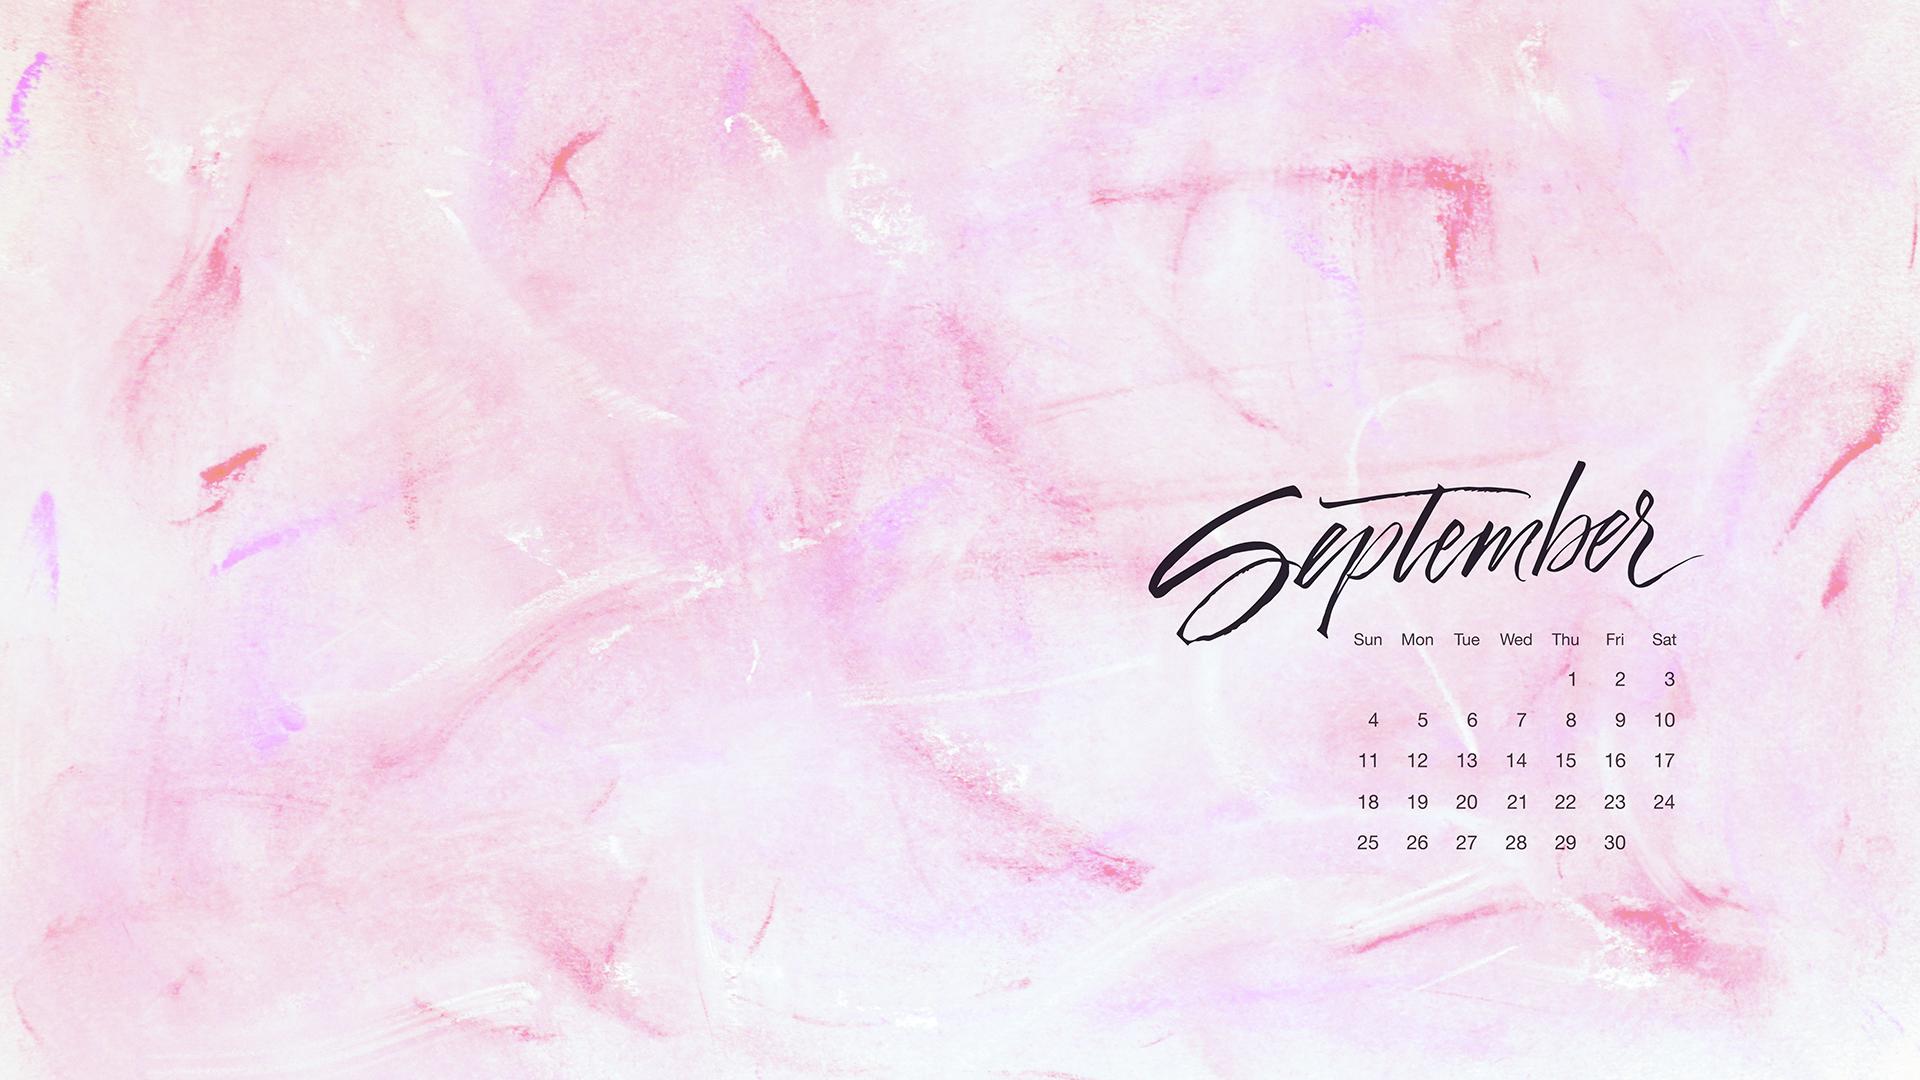 Calendar Desktop Wallpaper September : Free desktop calendar september — type and graphics lab